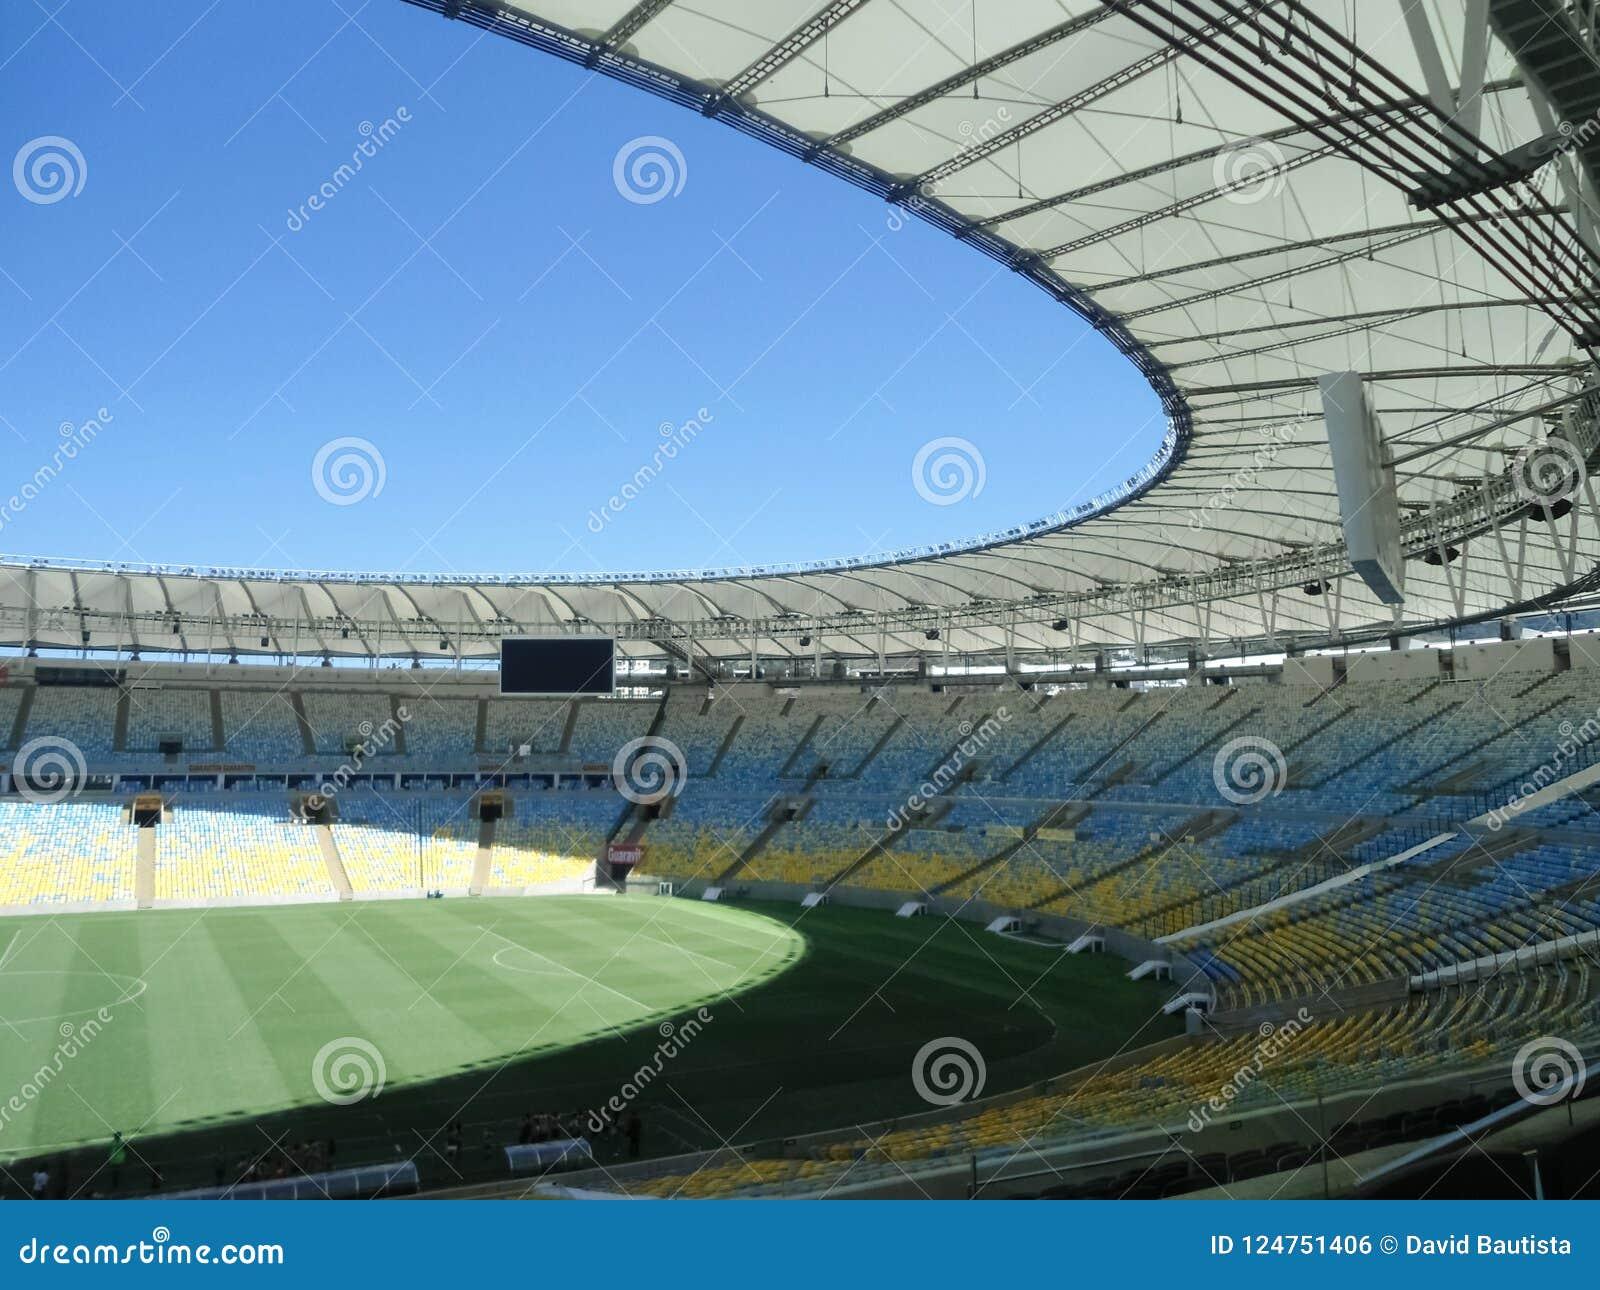 Maracana Stadium located in Rio de Janeiro Brazil. Empty soccer field.